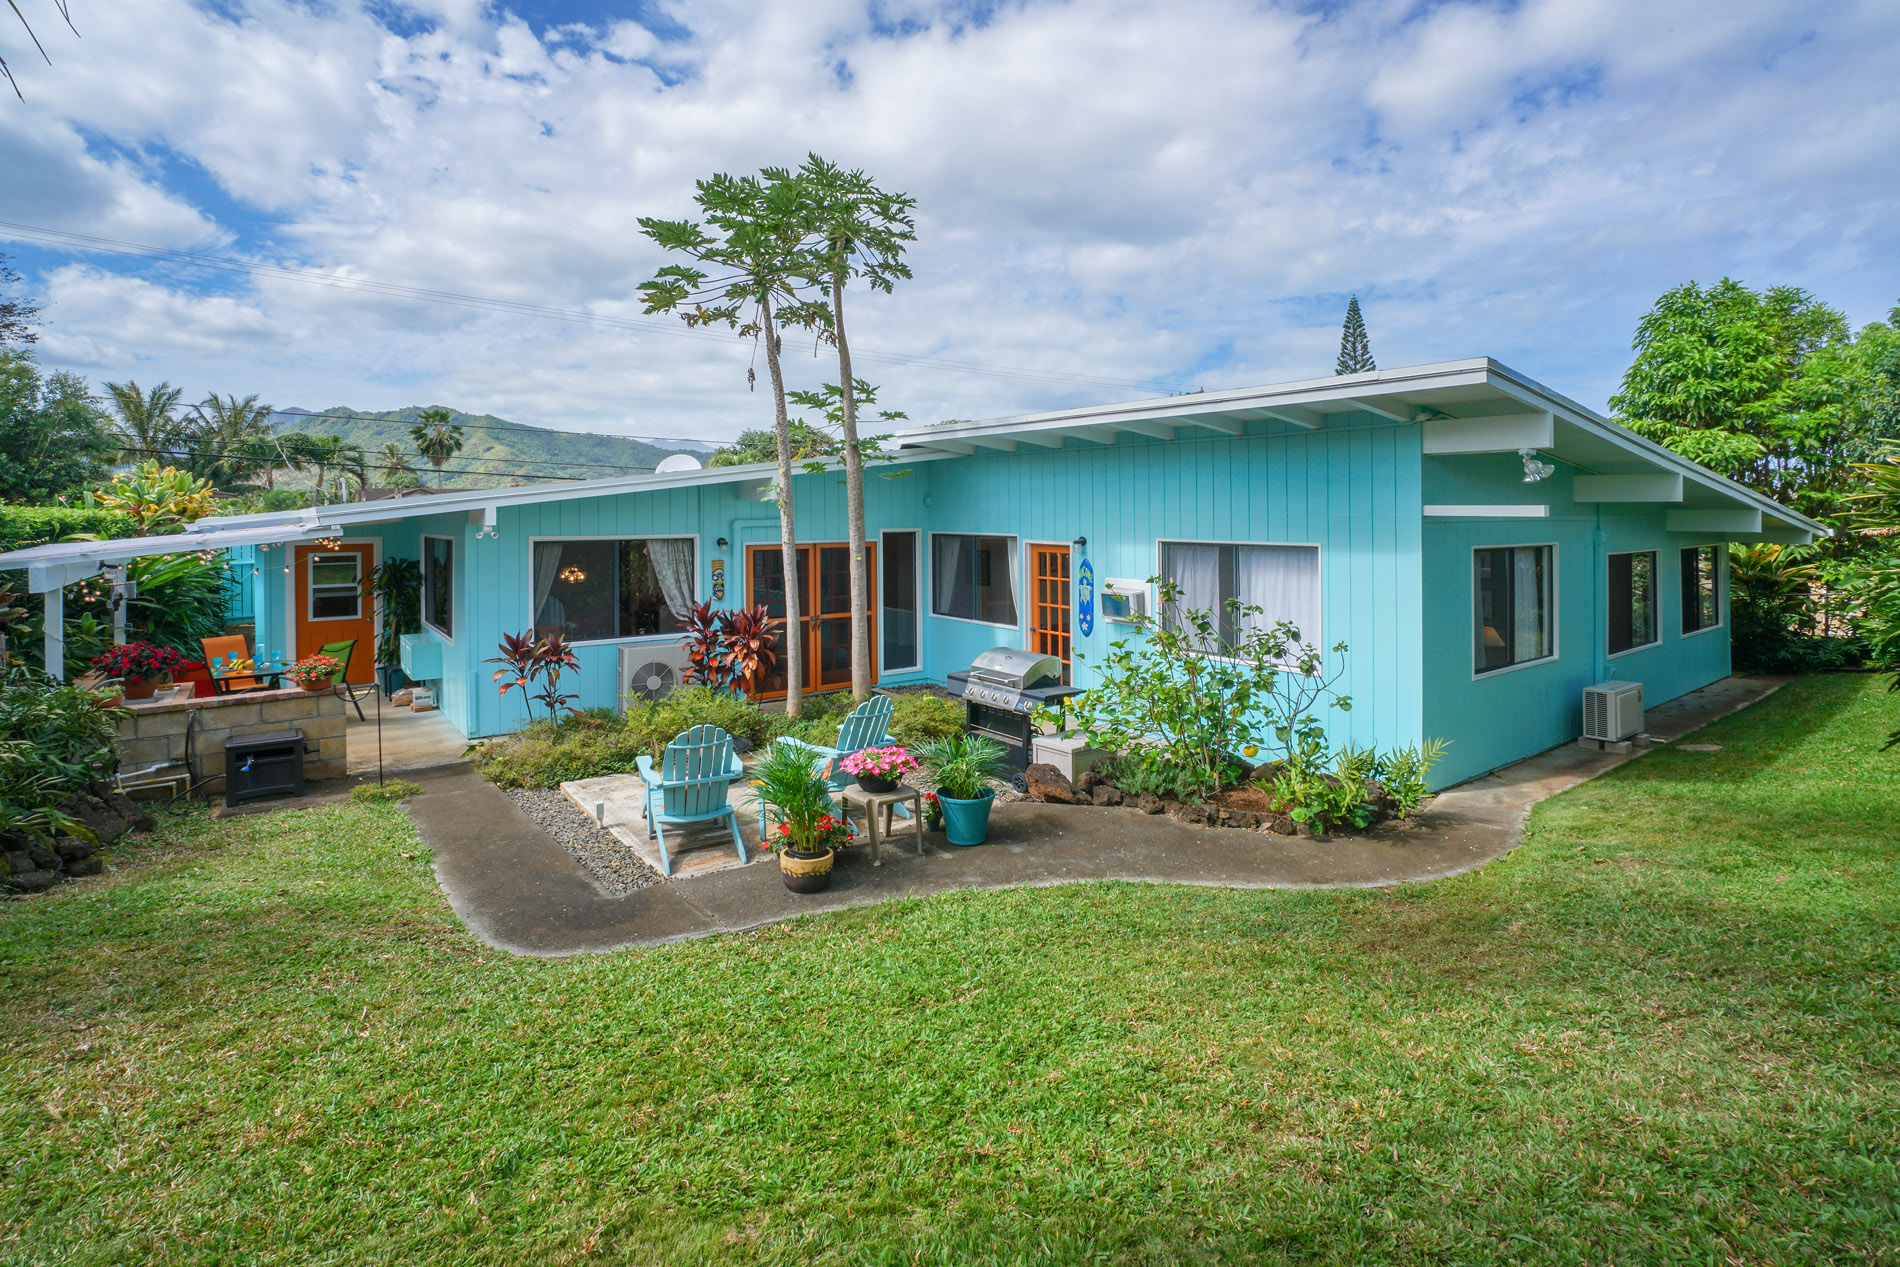 Single Family Home for Sale at Spacious Oahu Retreat 1289 Ulupii Street Kailua, Hawaii, 96734 United States